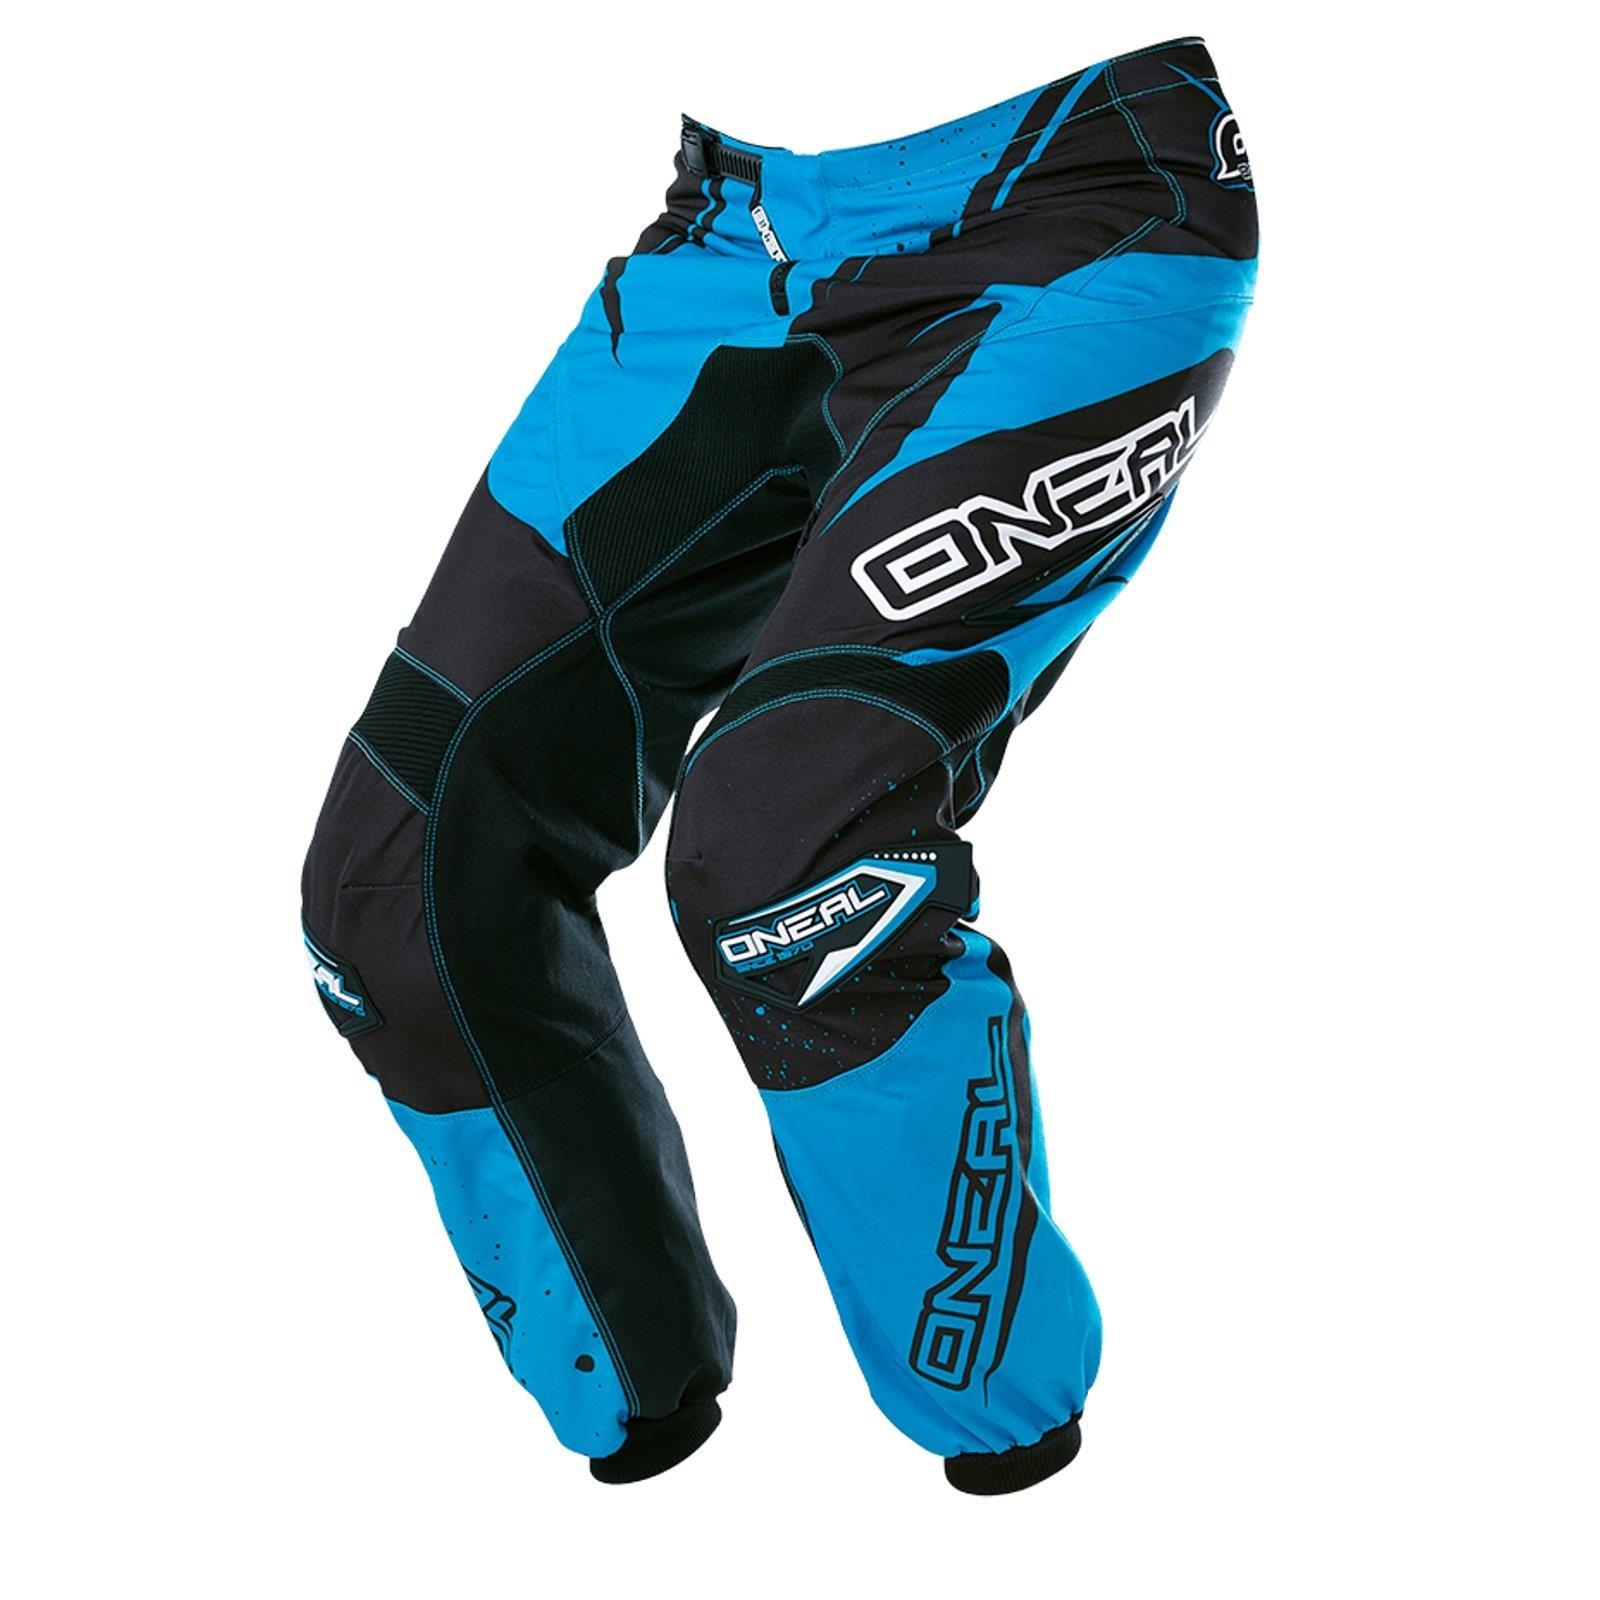 O-039-Neal-Element-MX-Pantaloni-Racewear-Pant-moto-cross-SX-Enduro-Fuoristrada-Moto-Quad miniatura 2